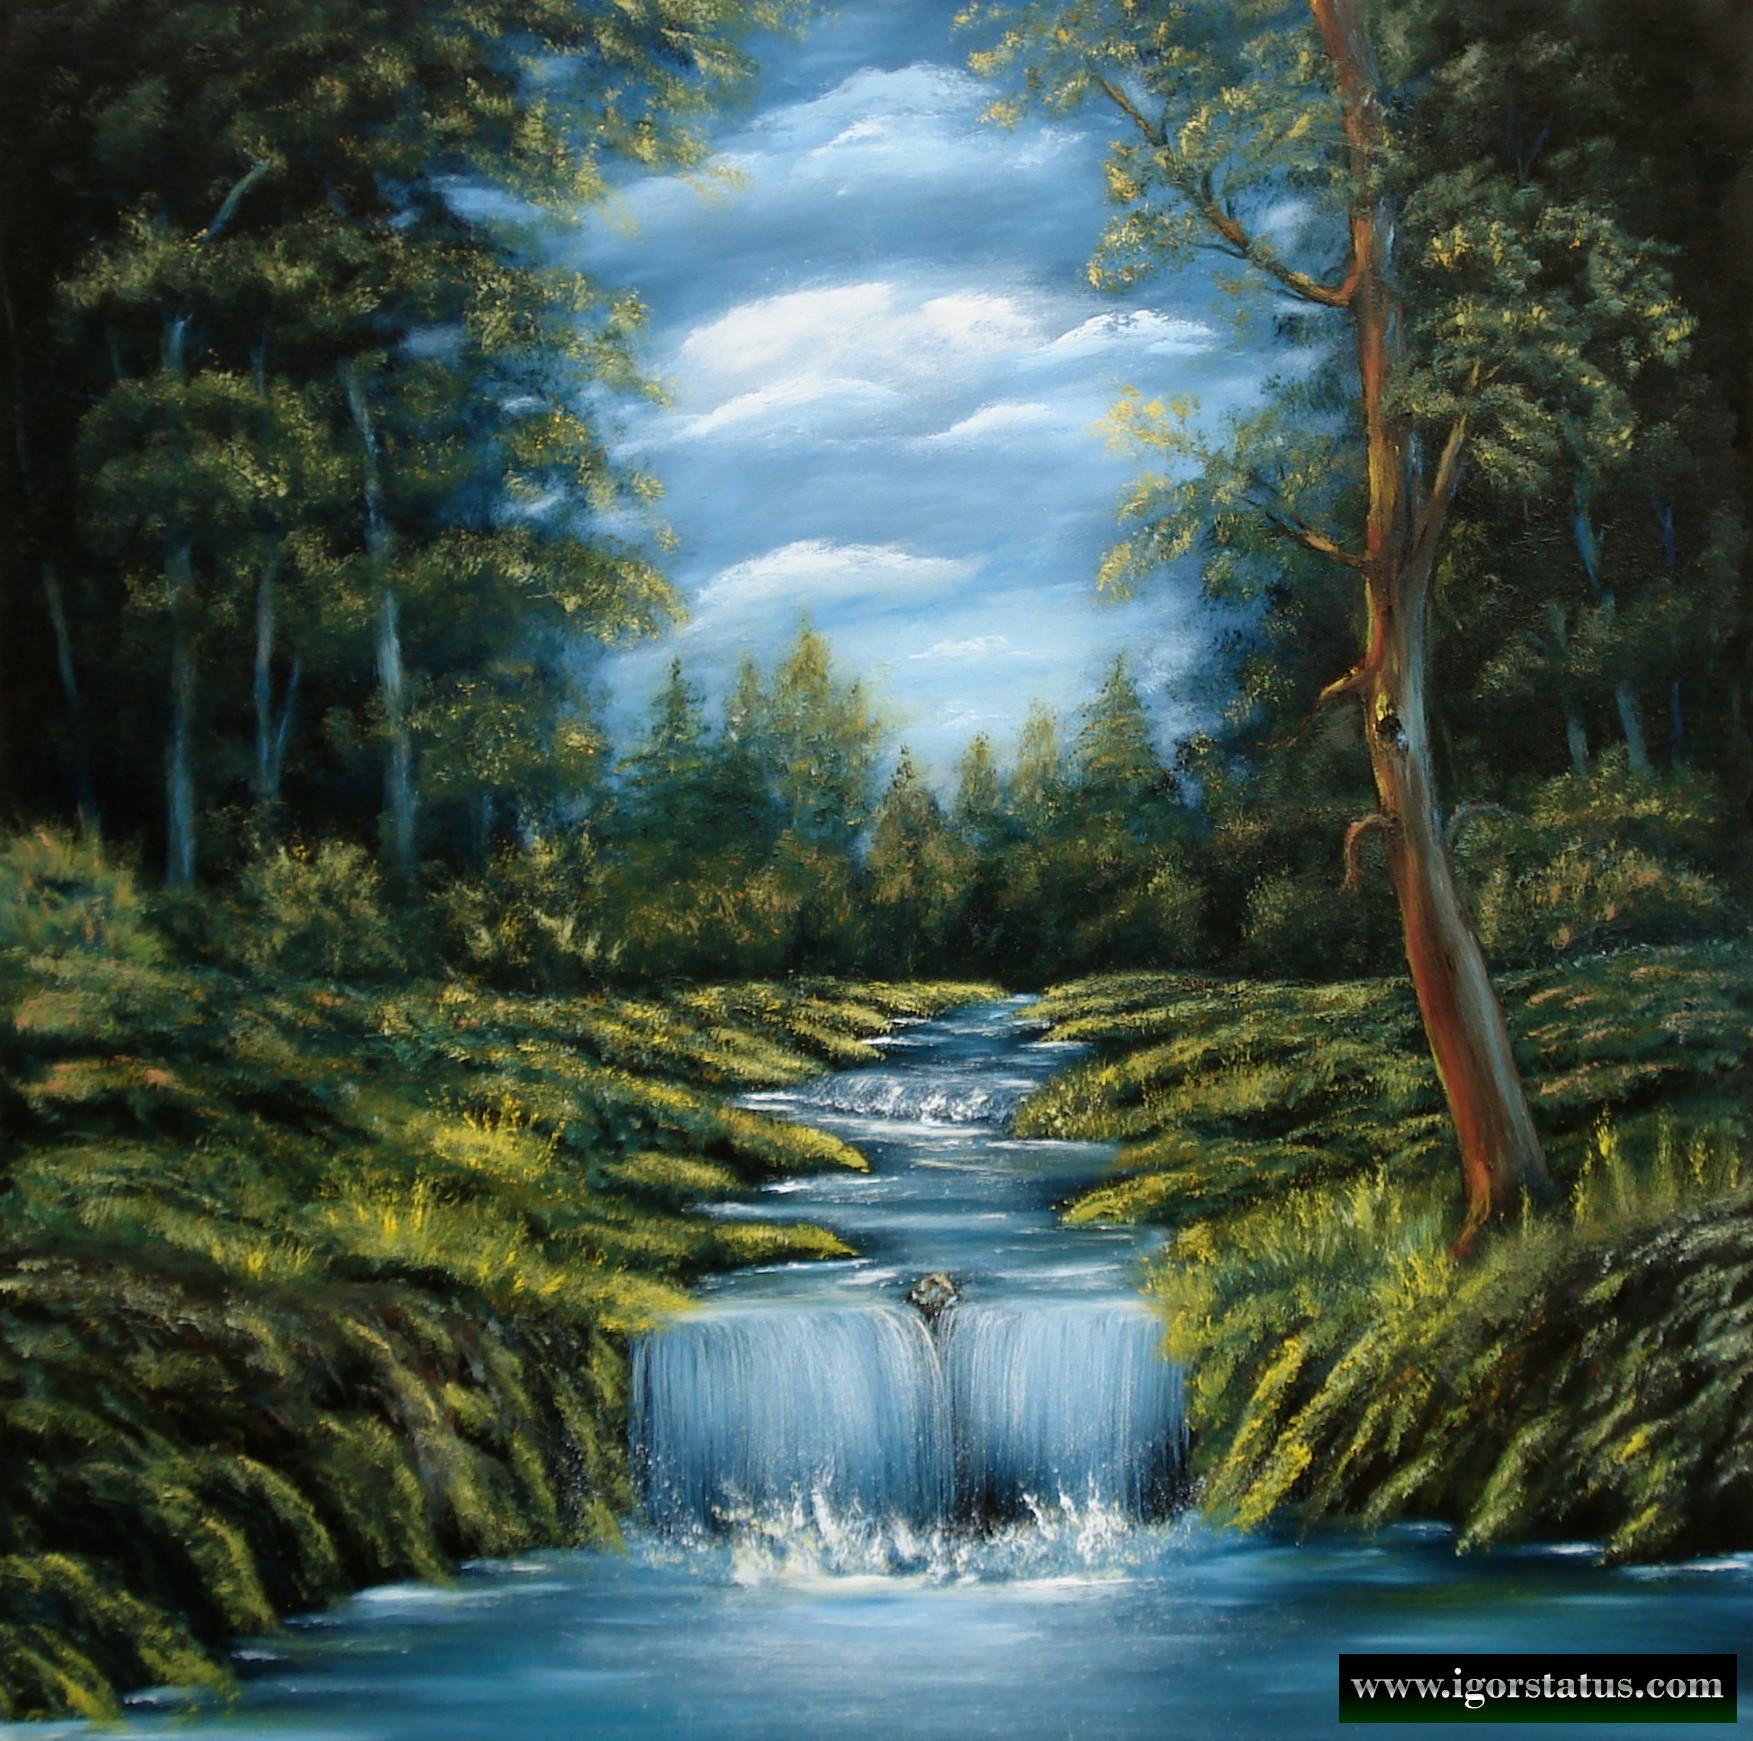 A mountain brook